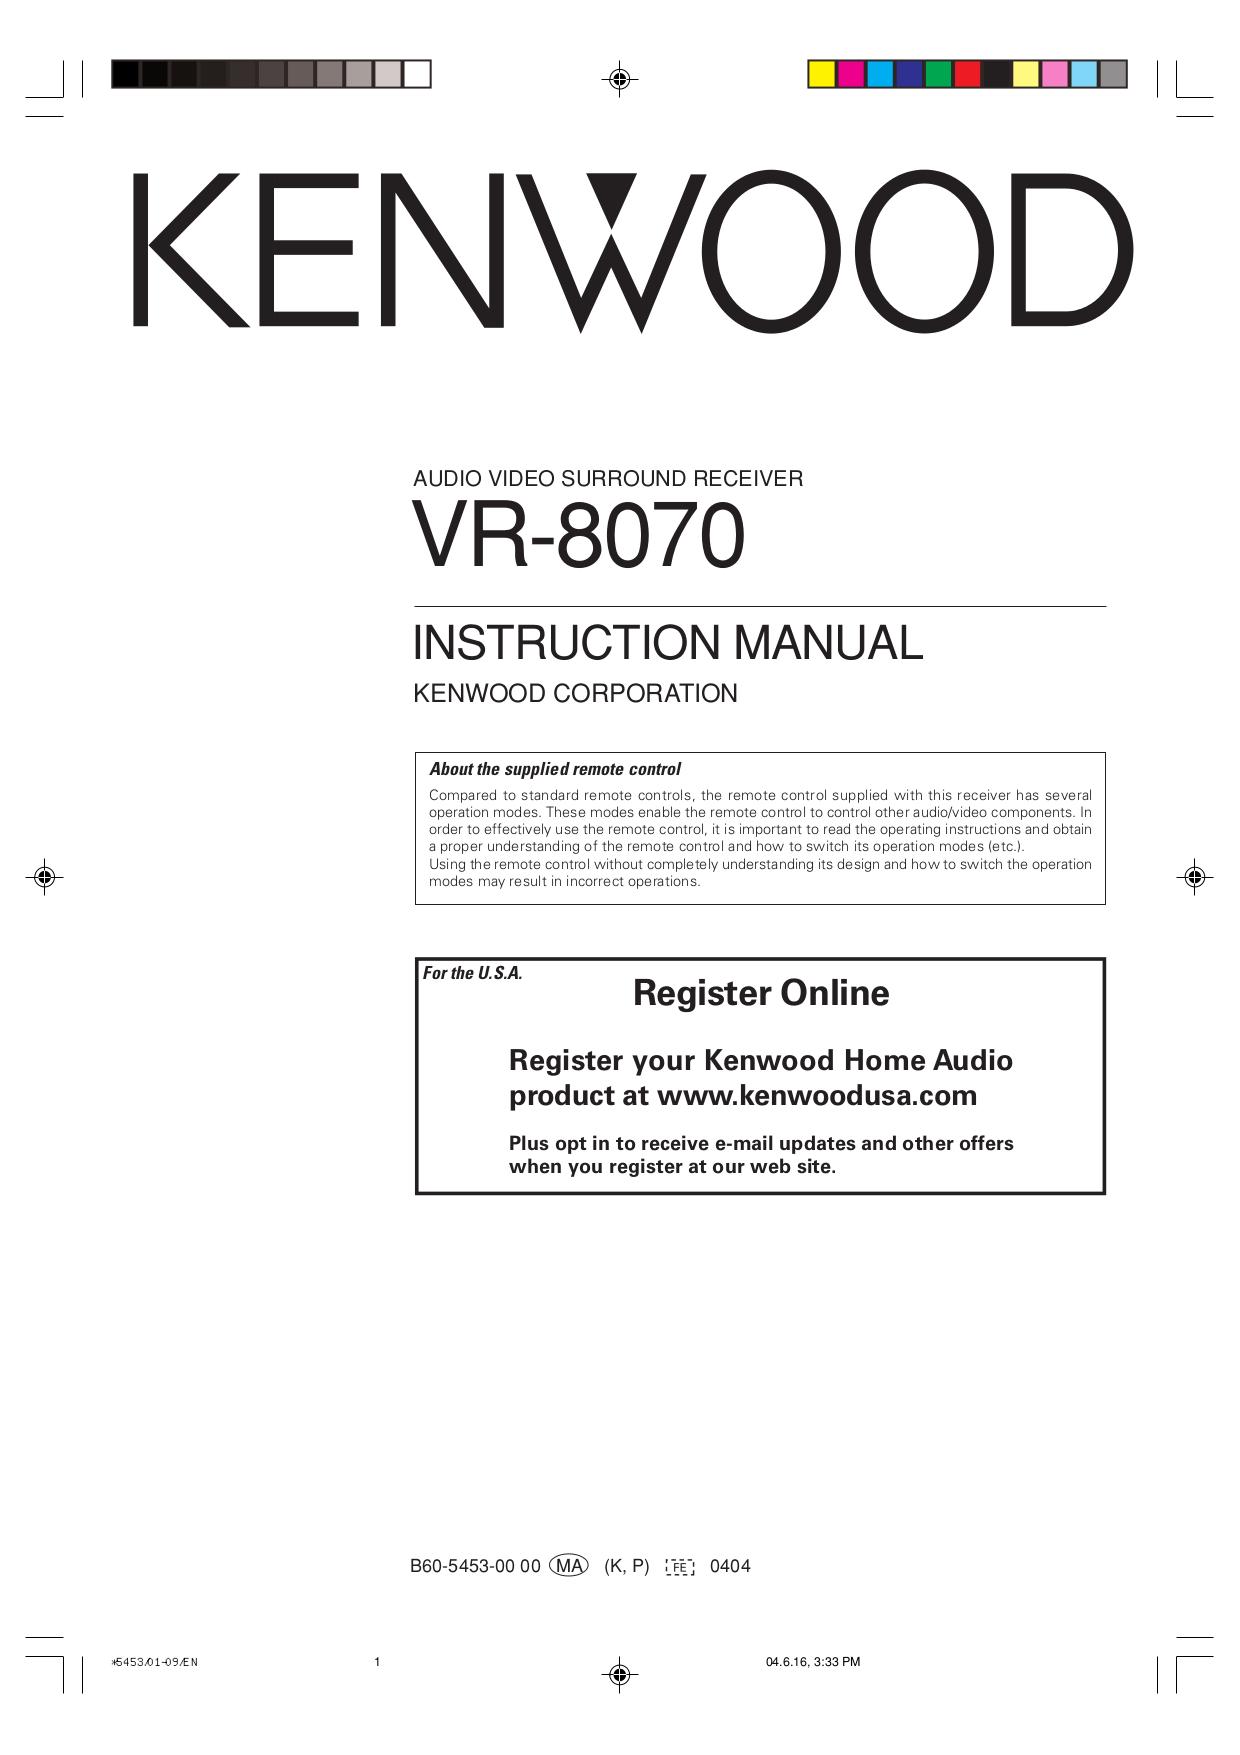 Download free pdf for kenwood vr-8070 receiver manual.